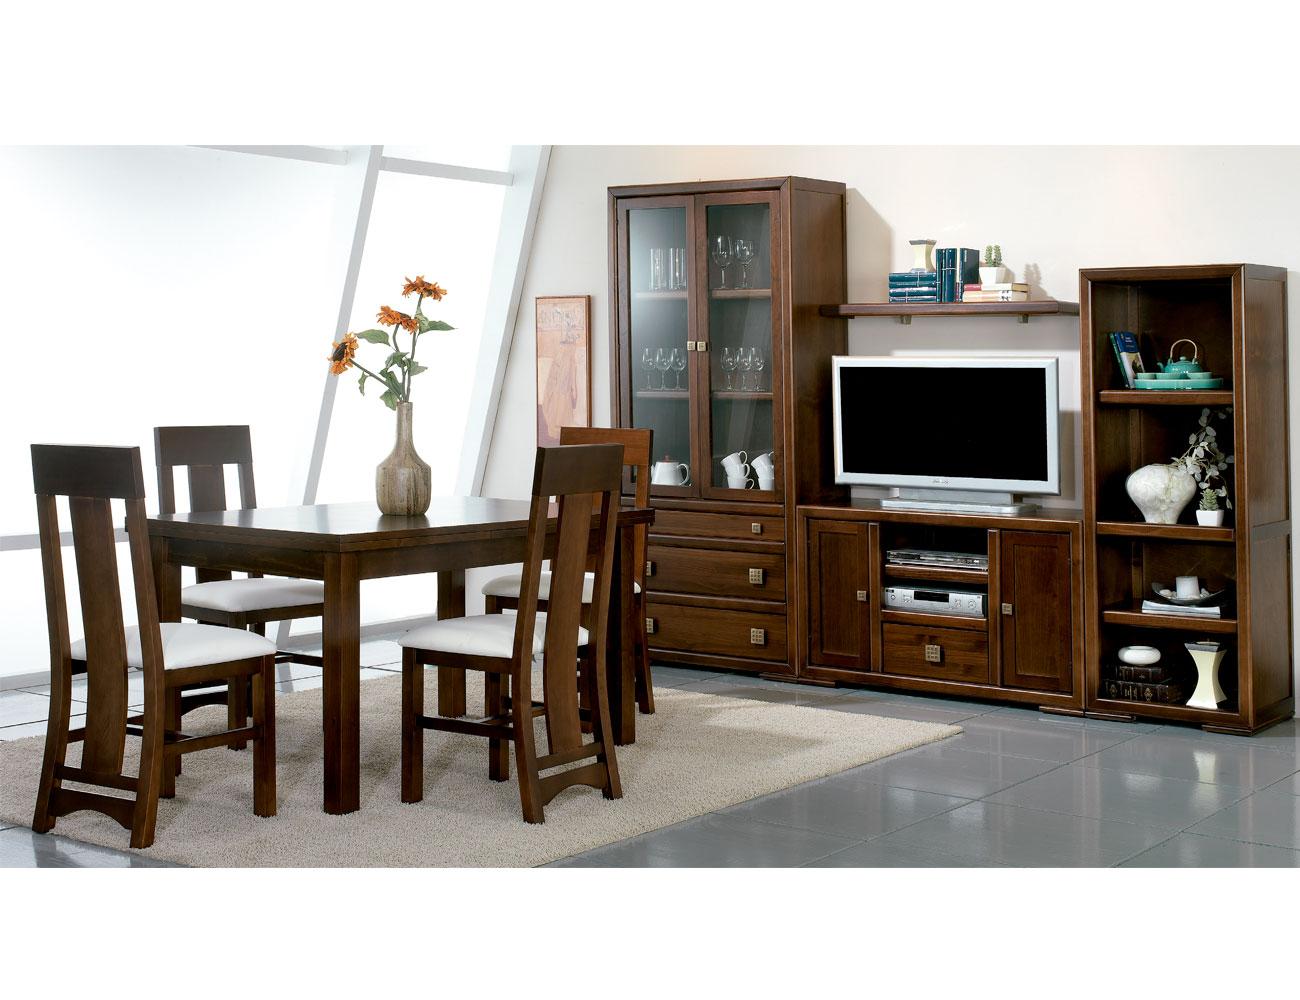 Composicion12 mueble salon comedor mesa silla2